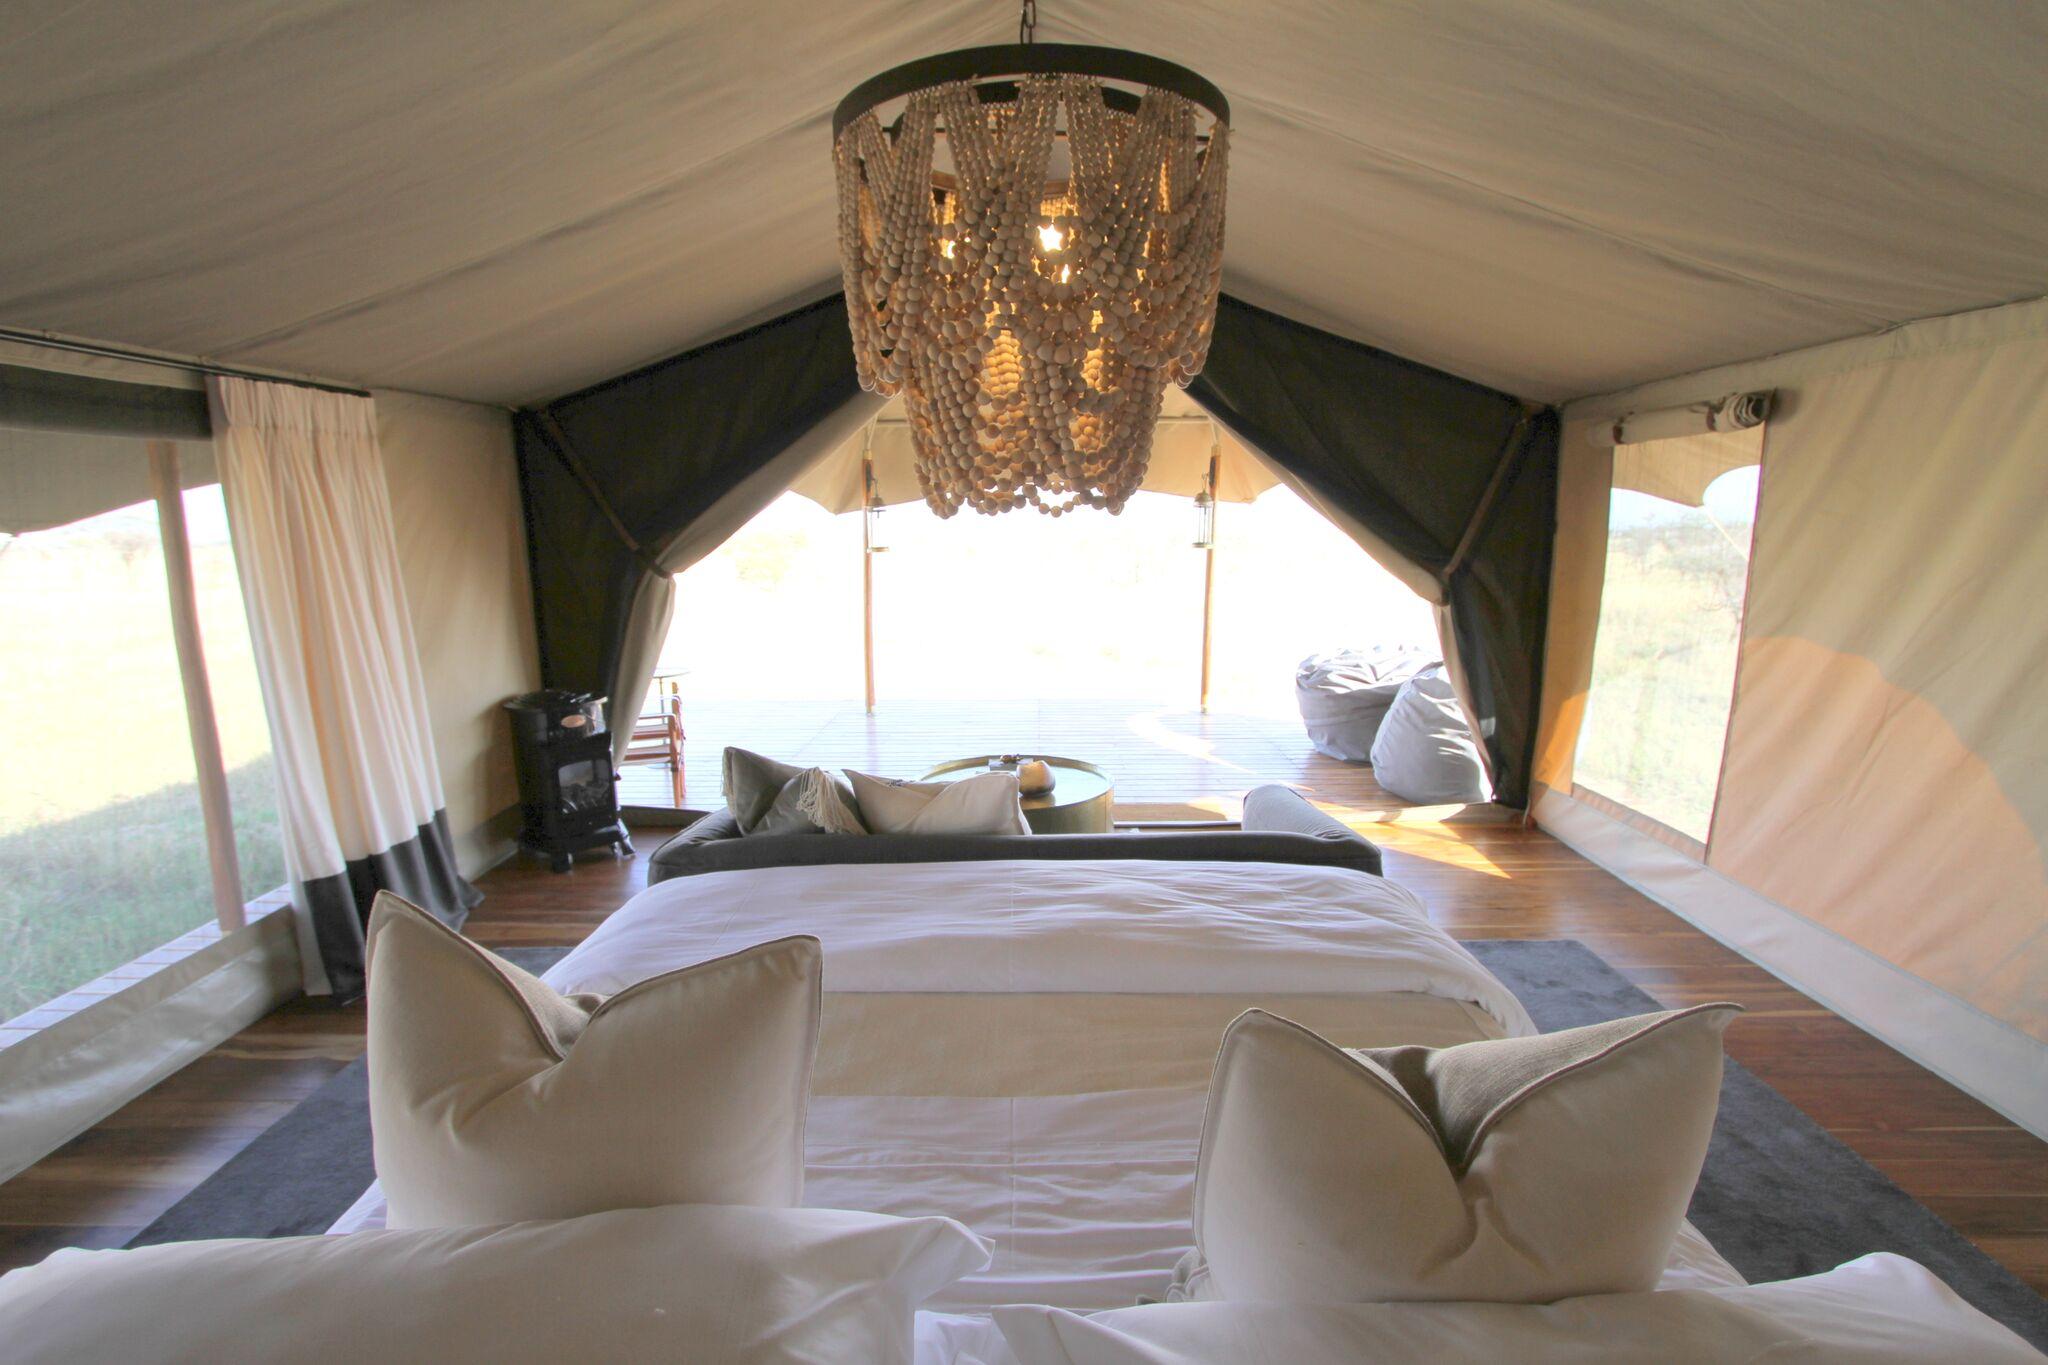 Accommodation Tent 5 (1).JPG